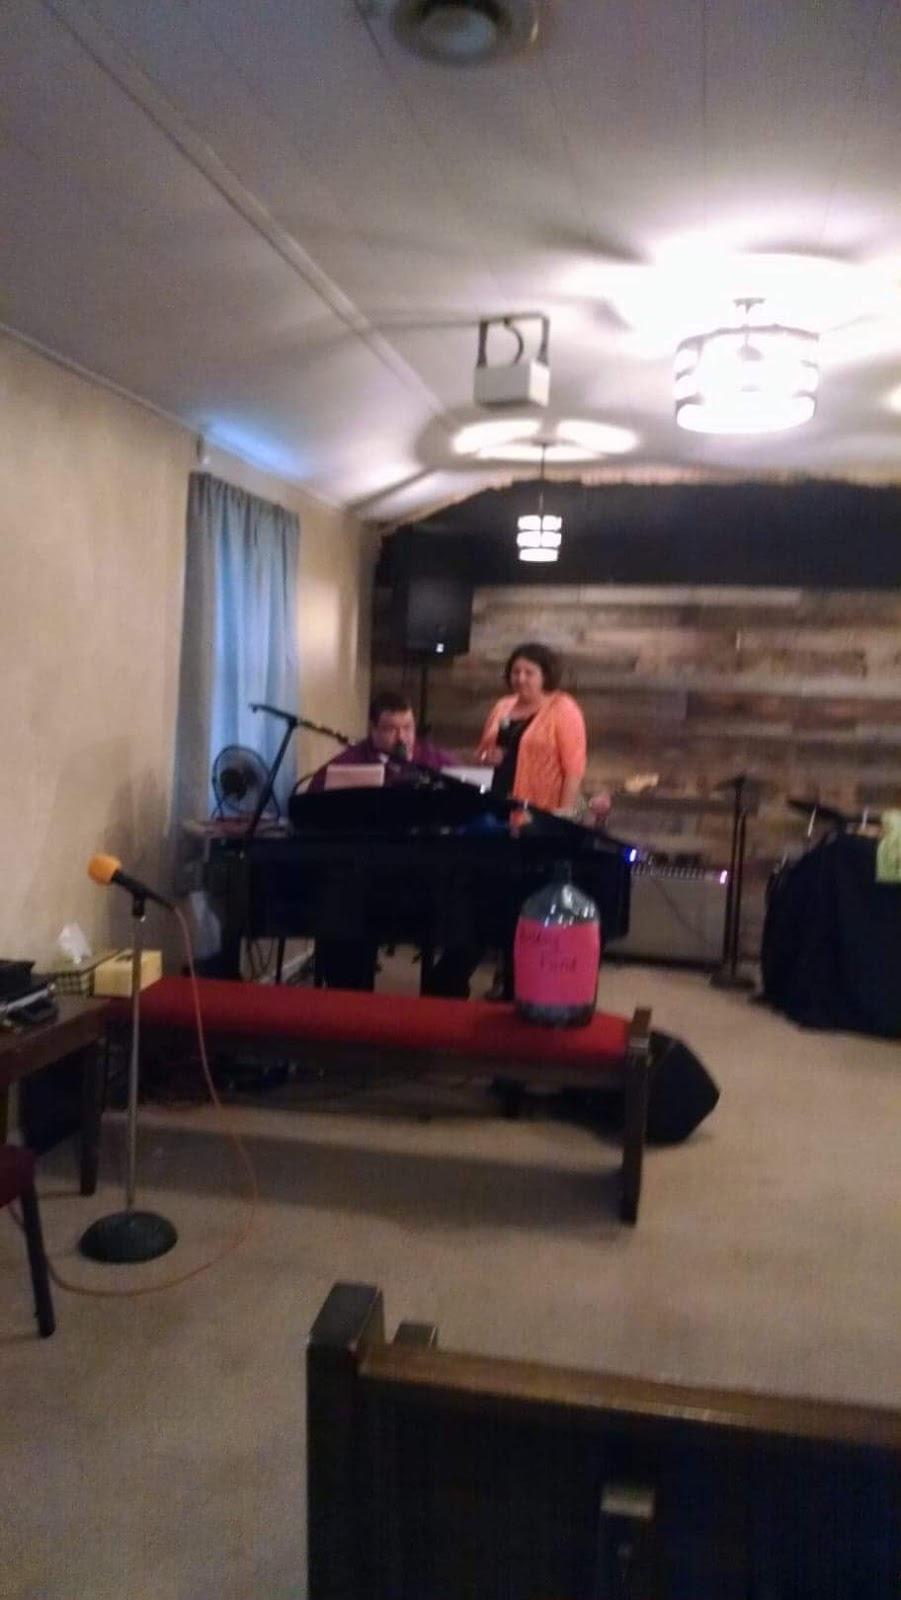 Trinity Full Gospel Ministries - church  | Photo 5 of 9 | Address: 3953 Casa Blvd, Grove City, OH 43123, USA | Phone: (614) 584-0915